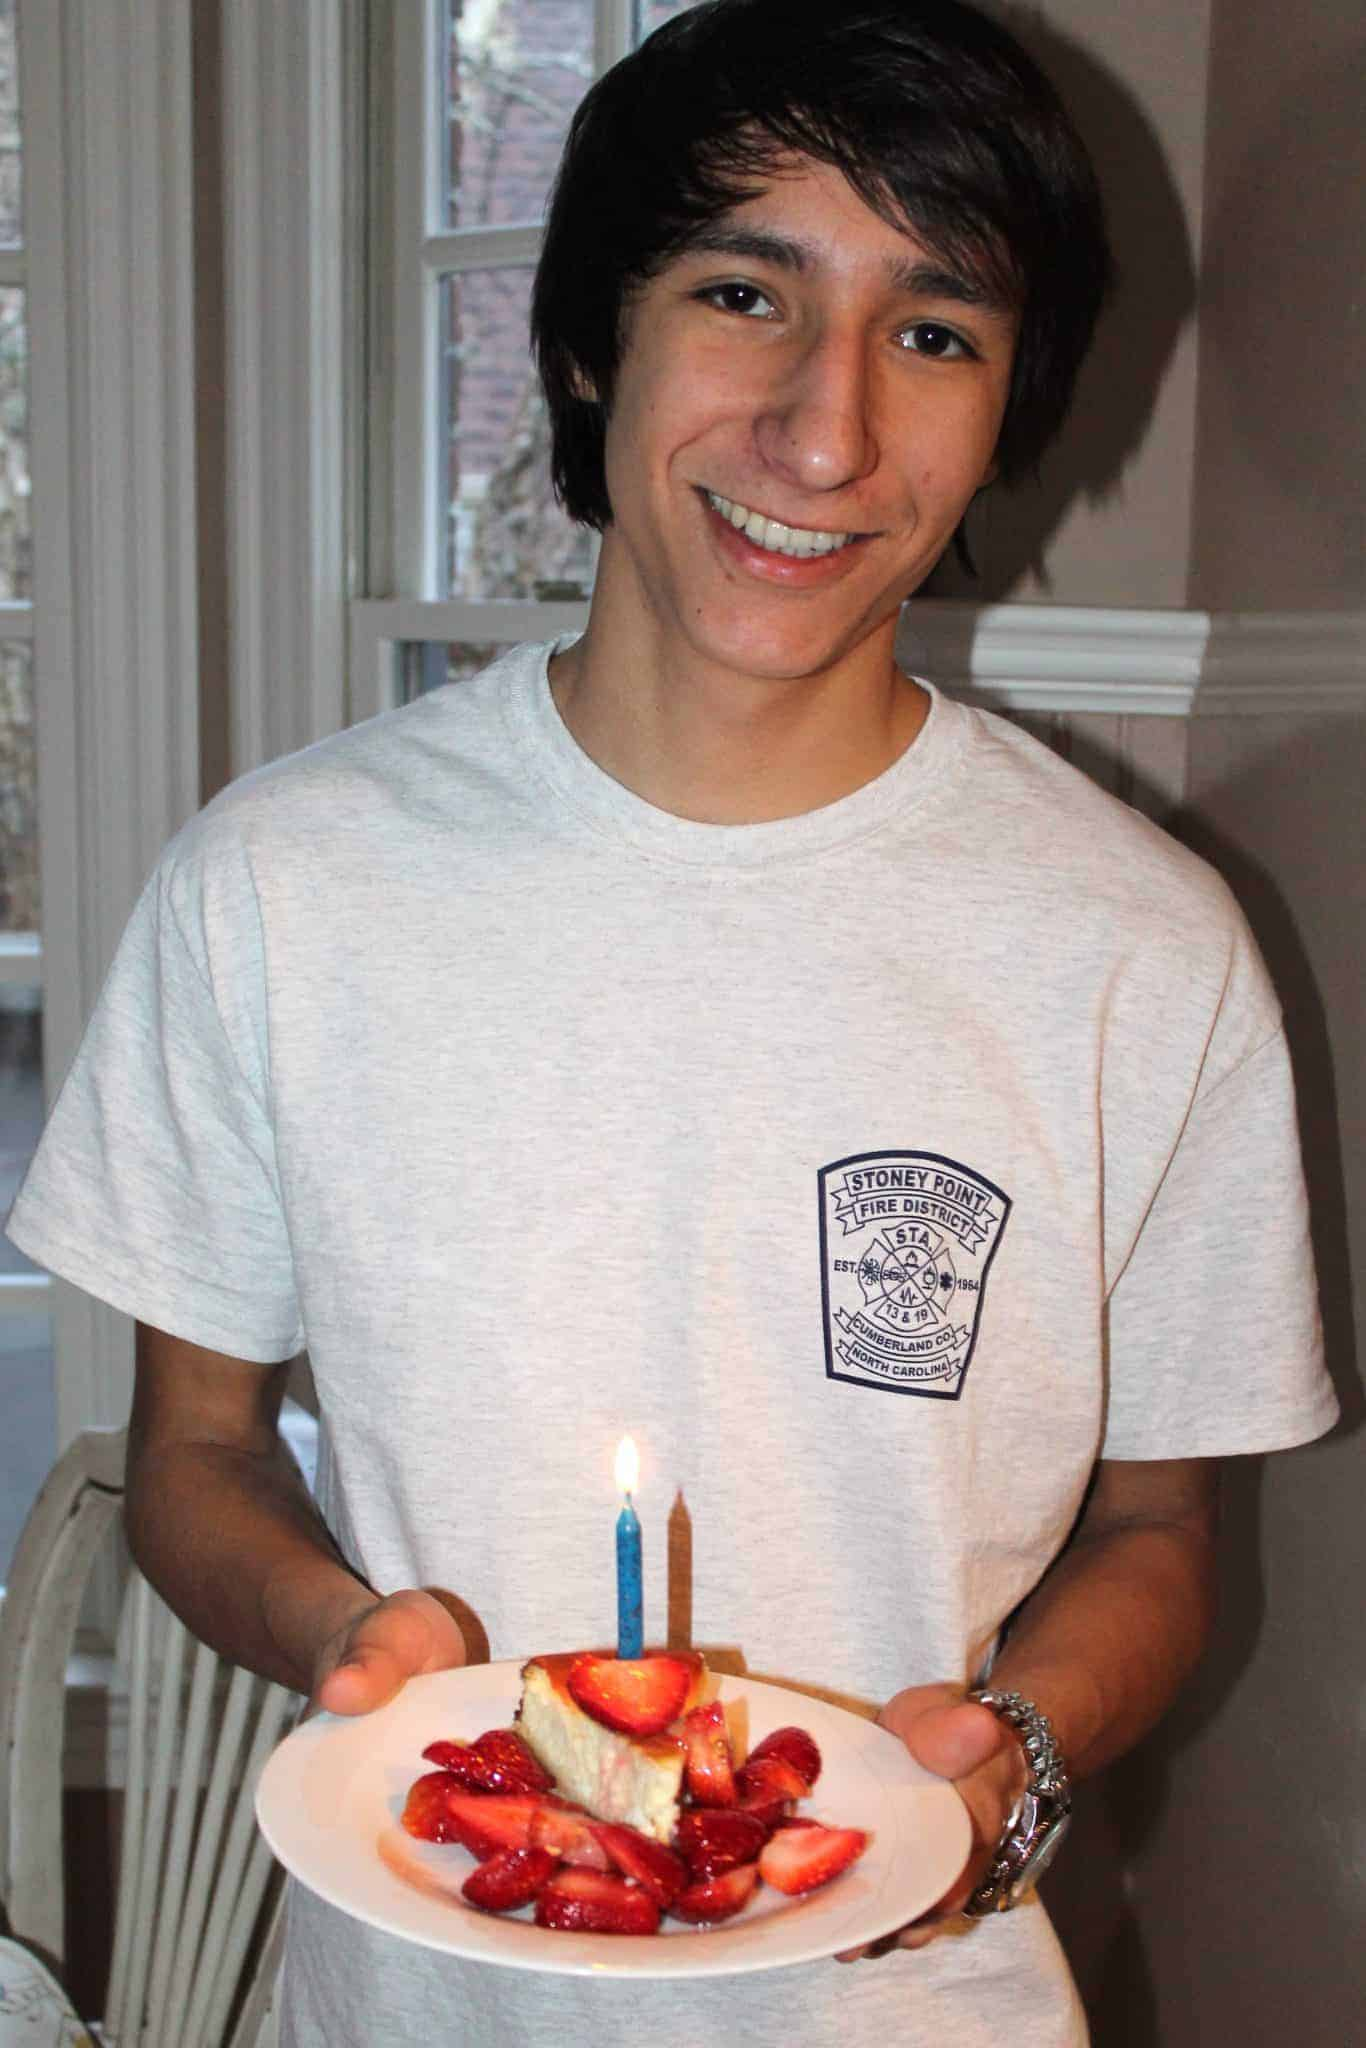 My Son, Joe's Birthday Cheesecake